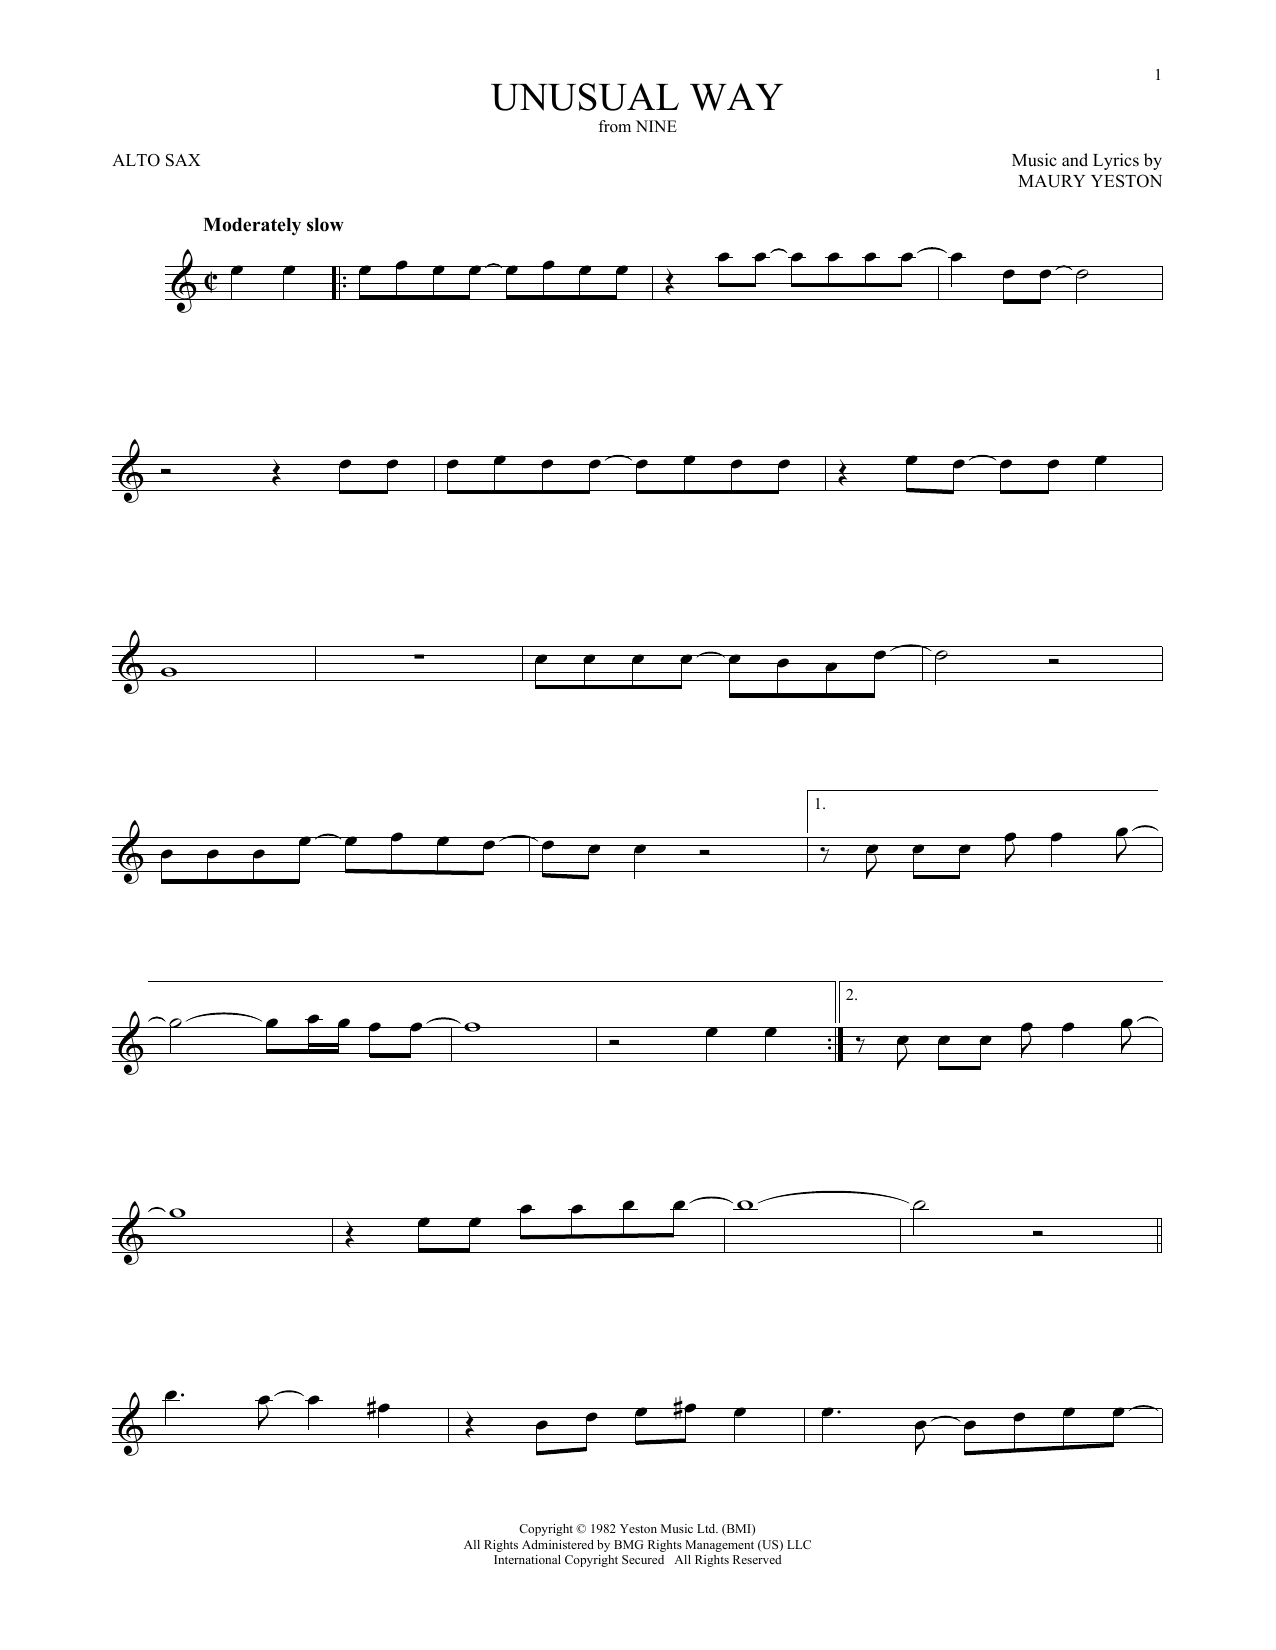 Unusual Way (Alto Sax Solo)